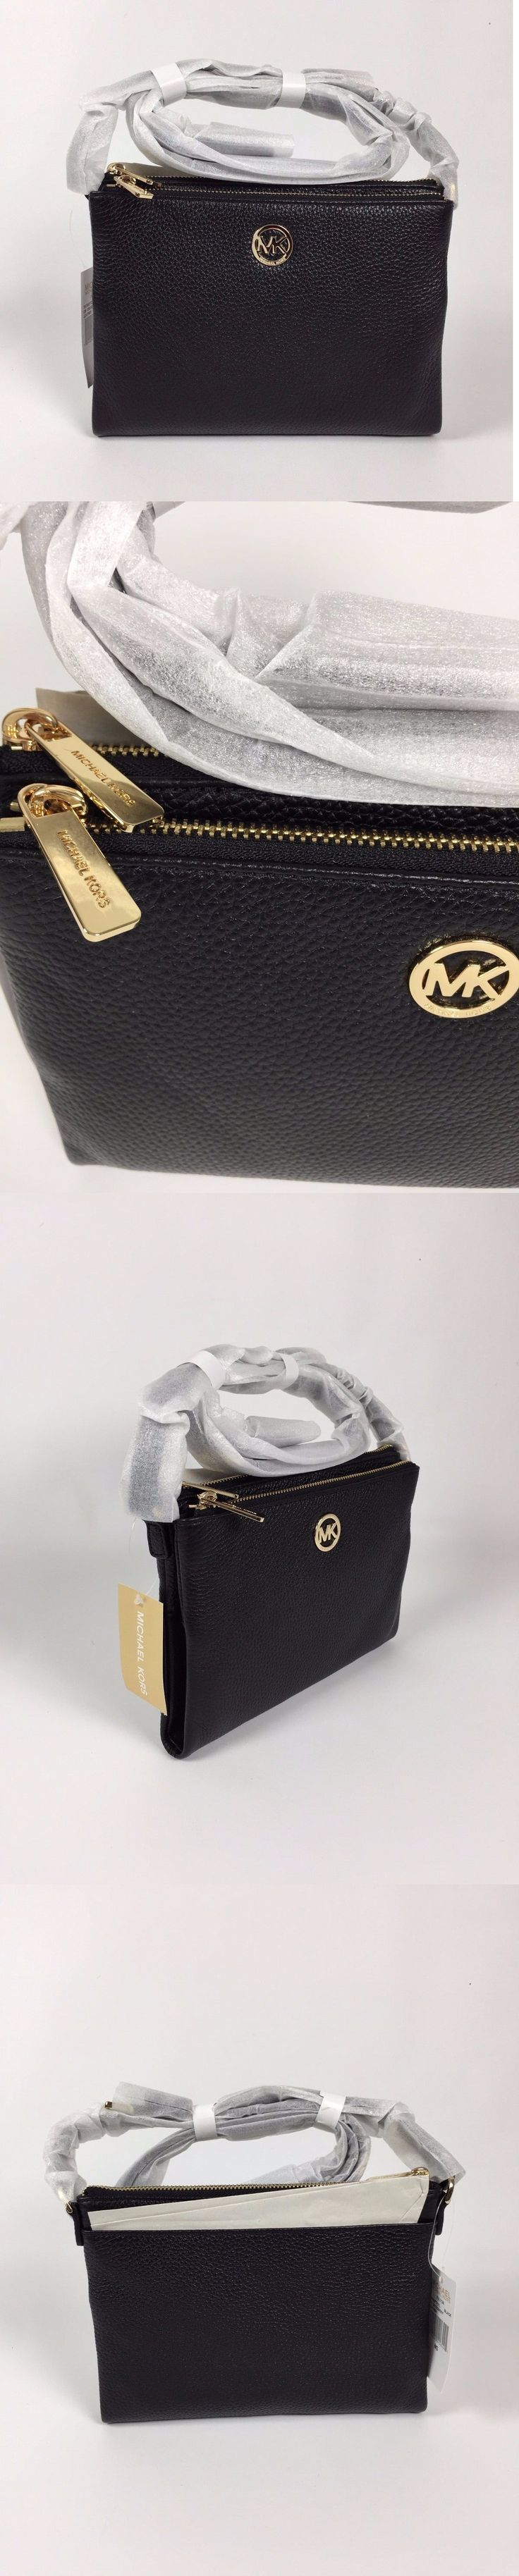 Women Handbags and Purses: Nwt Michael Kors Black Crossbody Leather Handbag Mk Signature Messenger Bag -> BUY IT NOW ONLY: $118 on eBay!